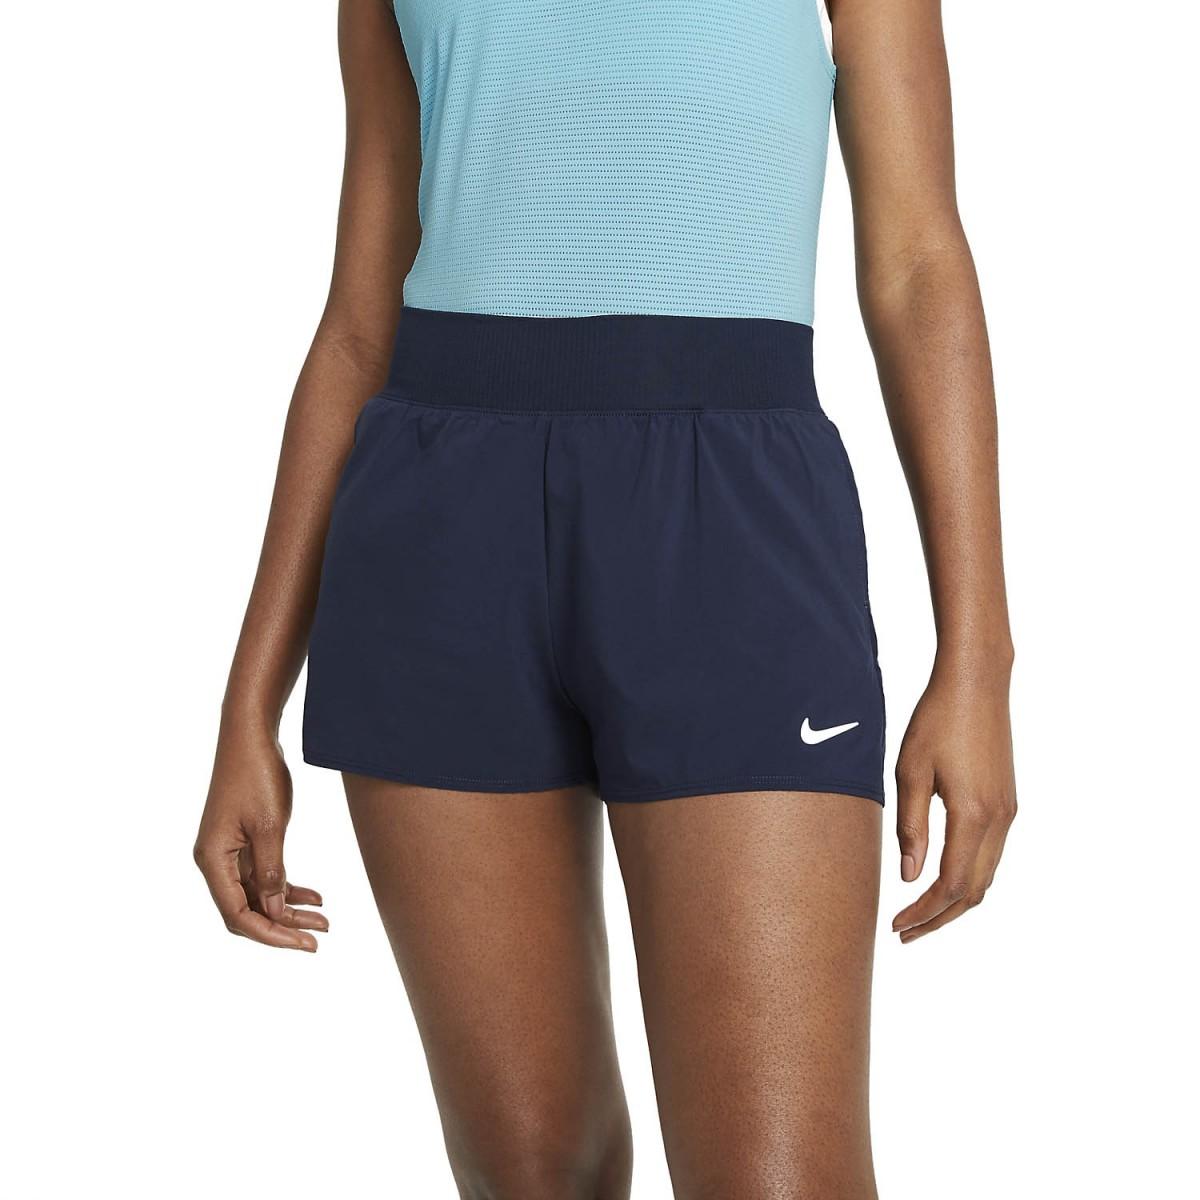 Теннисные шорты женские Nike Court Victory Short obsidian/white